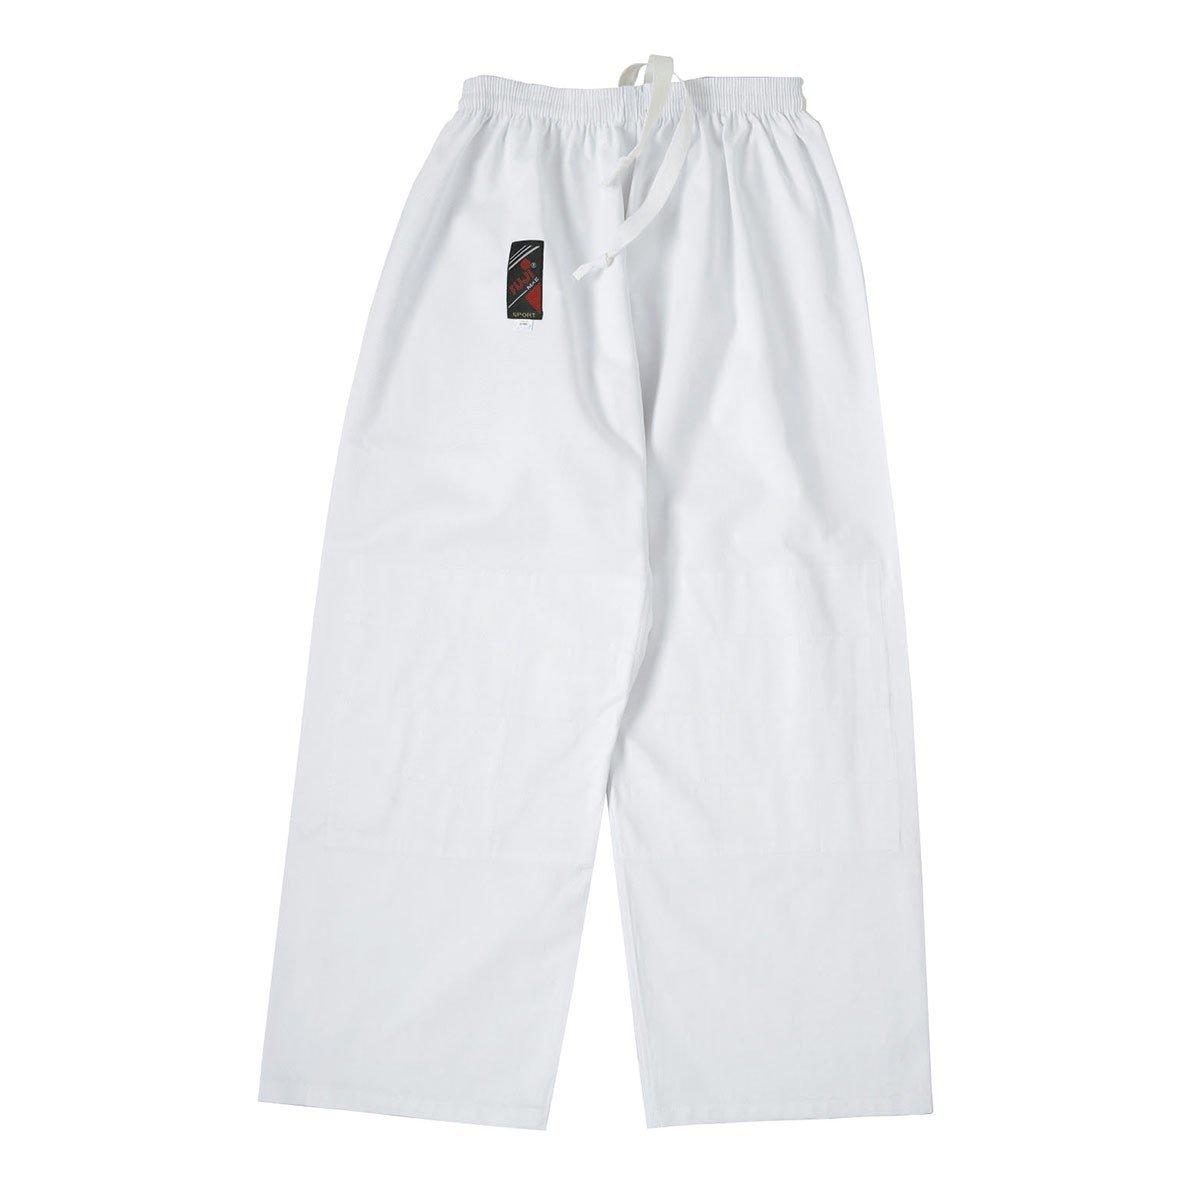 Pantalon de Judo blanc FUJI MAE